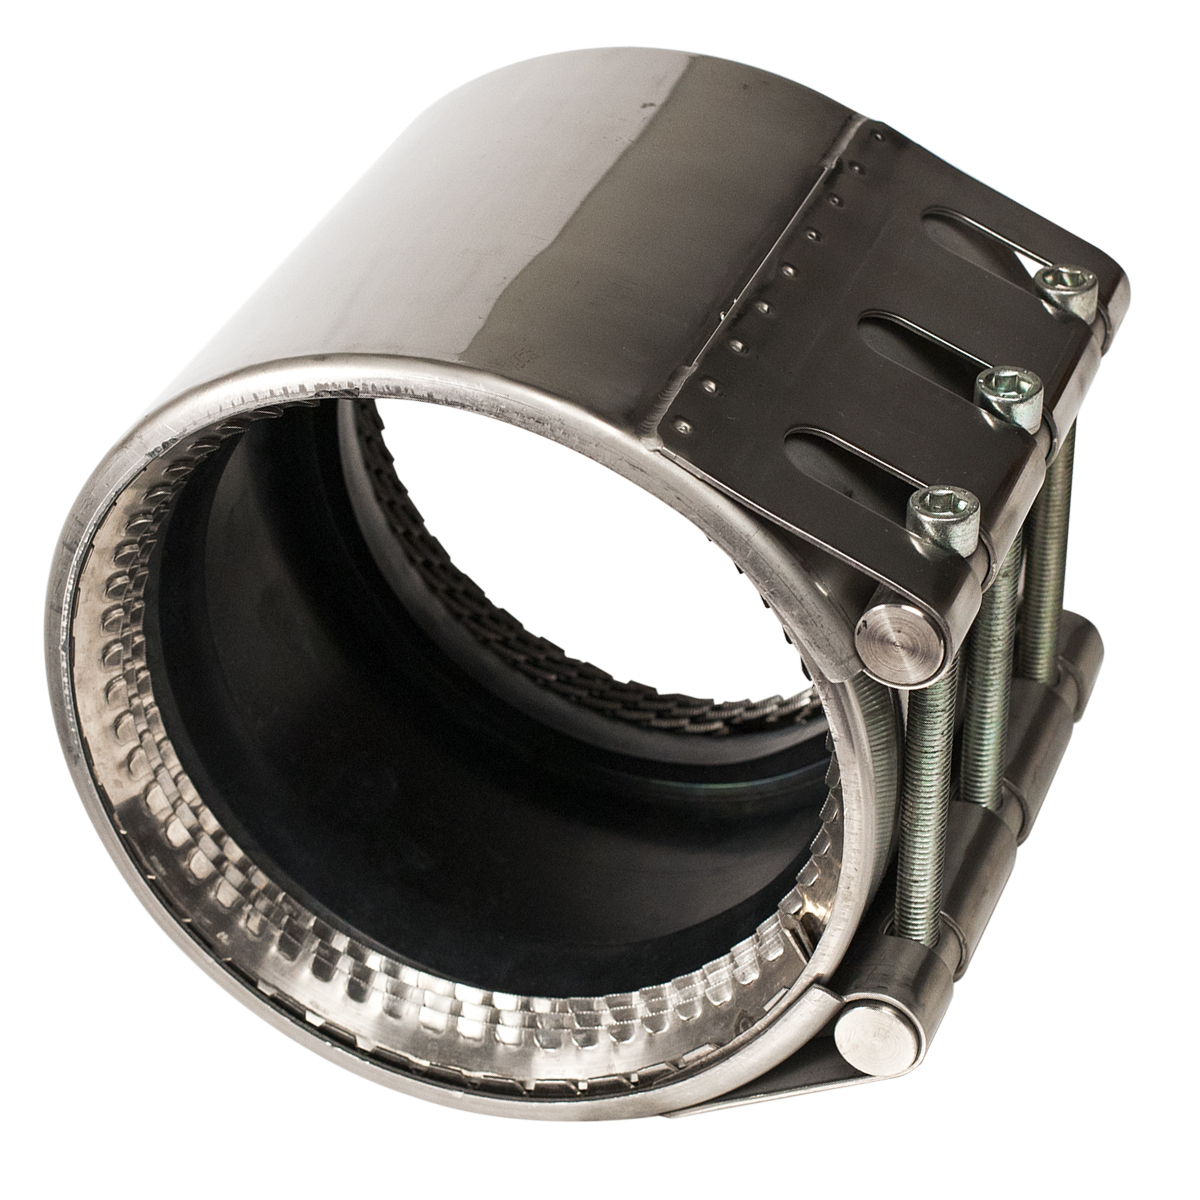 ARMOR LOCK - Restraint coupling